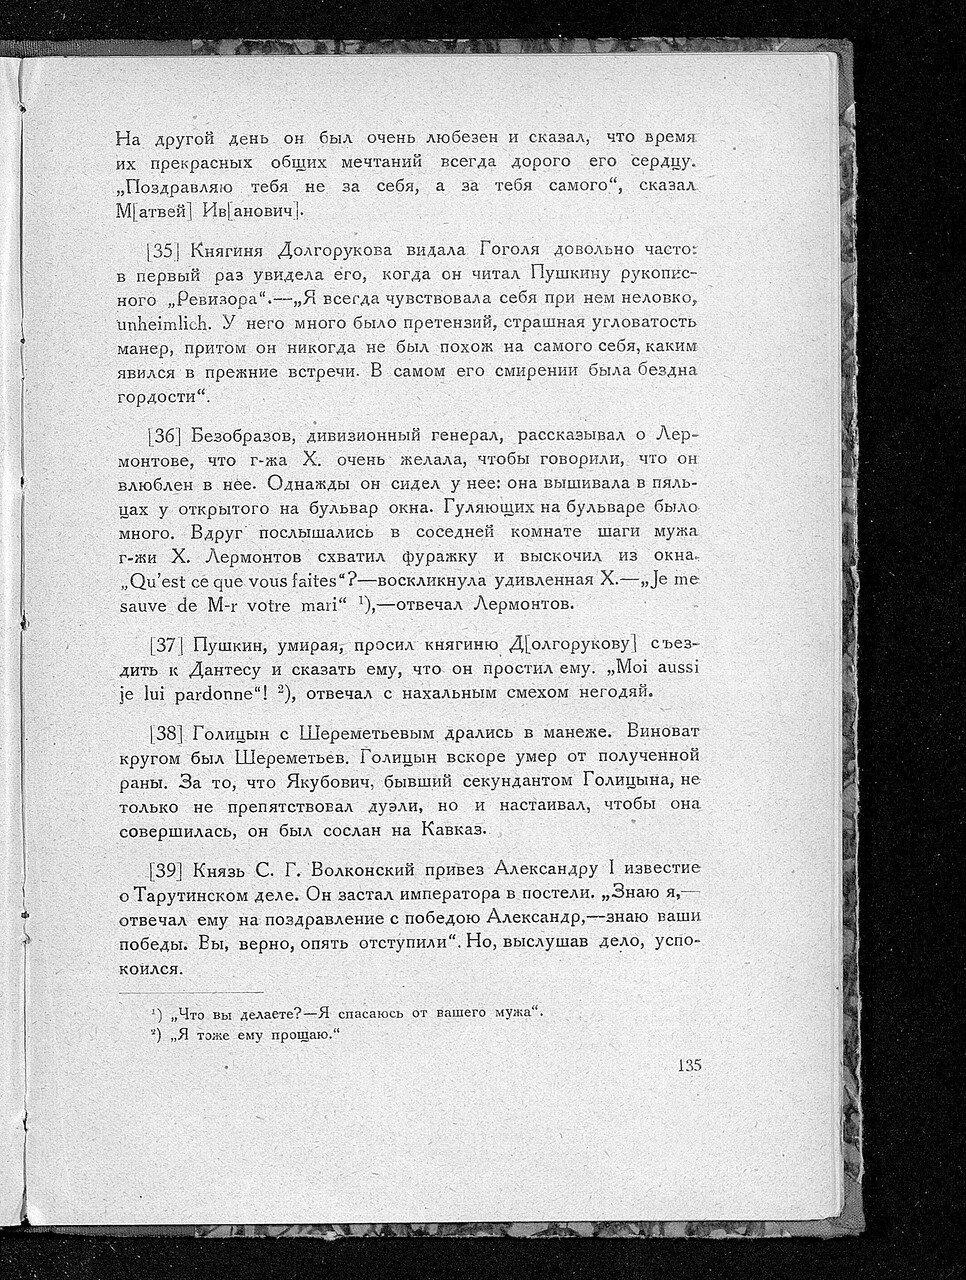 https://img-fotki.yandex.ru/get/515846/199368979.a2/0_214380_9056f6f7_XXXL.jpg